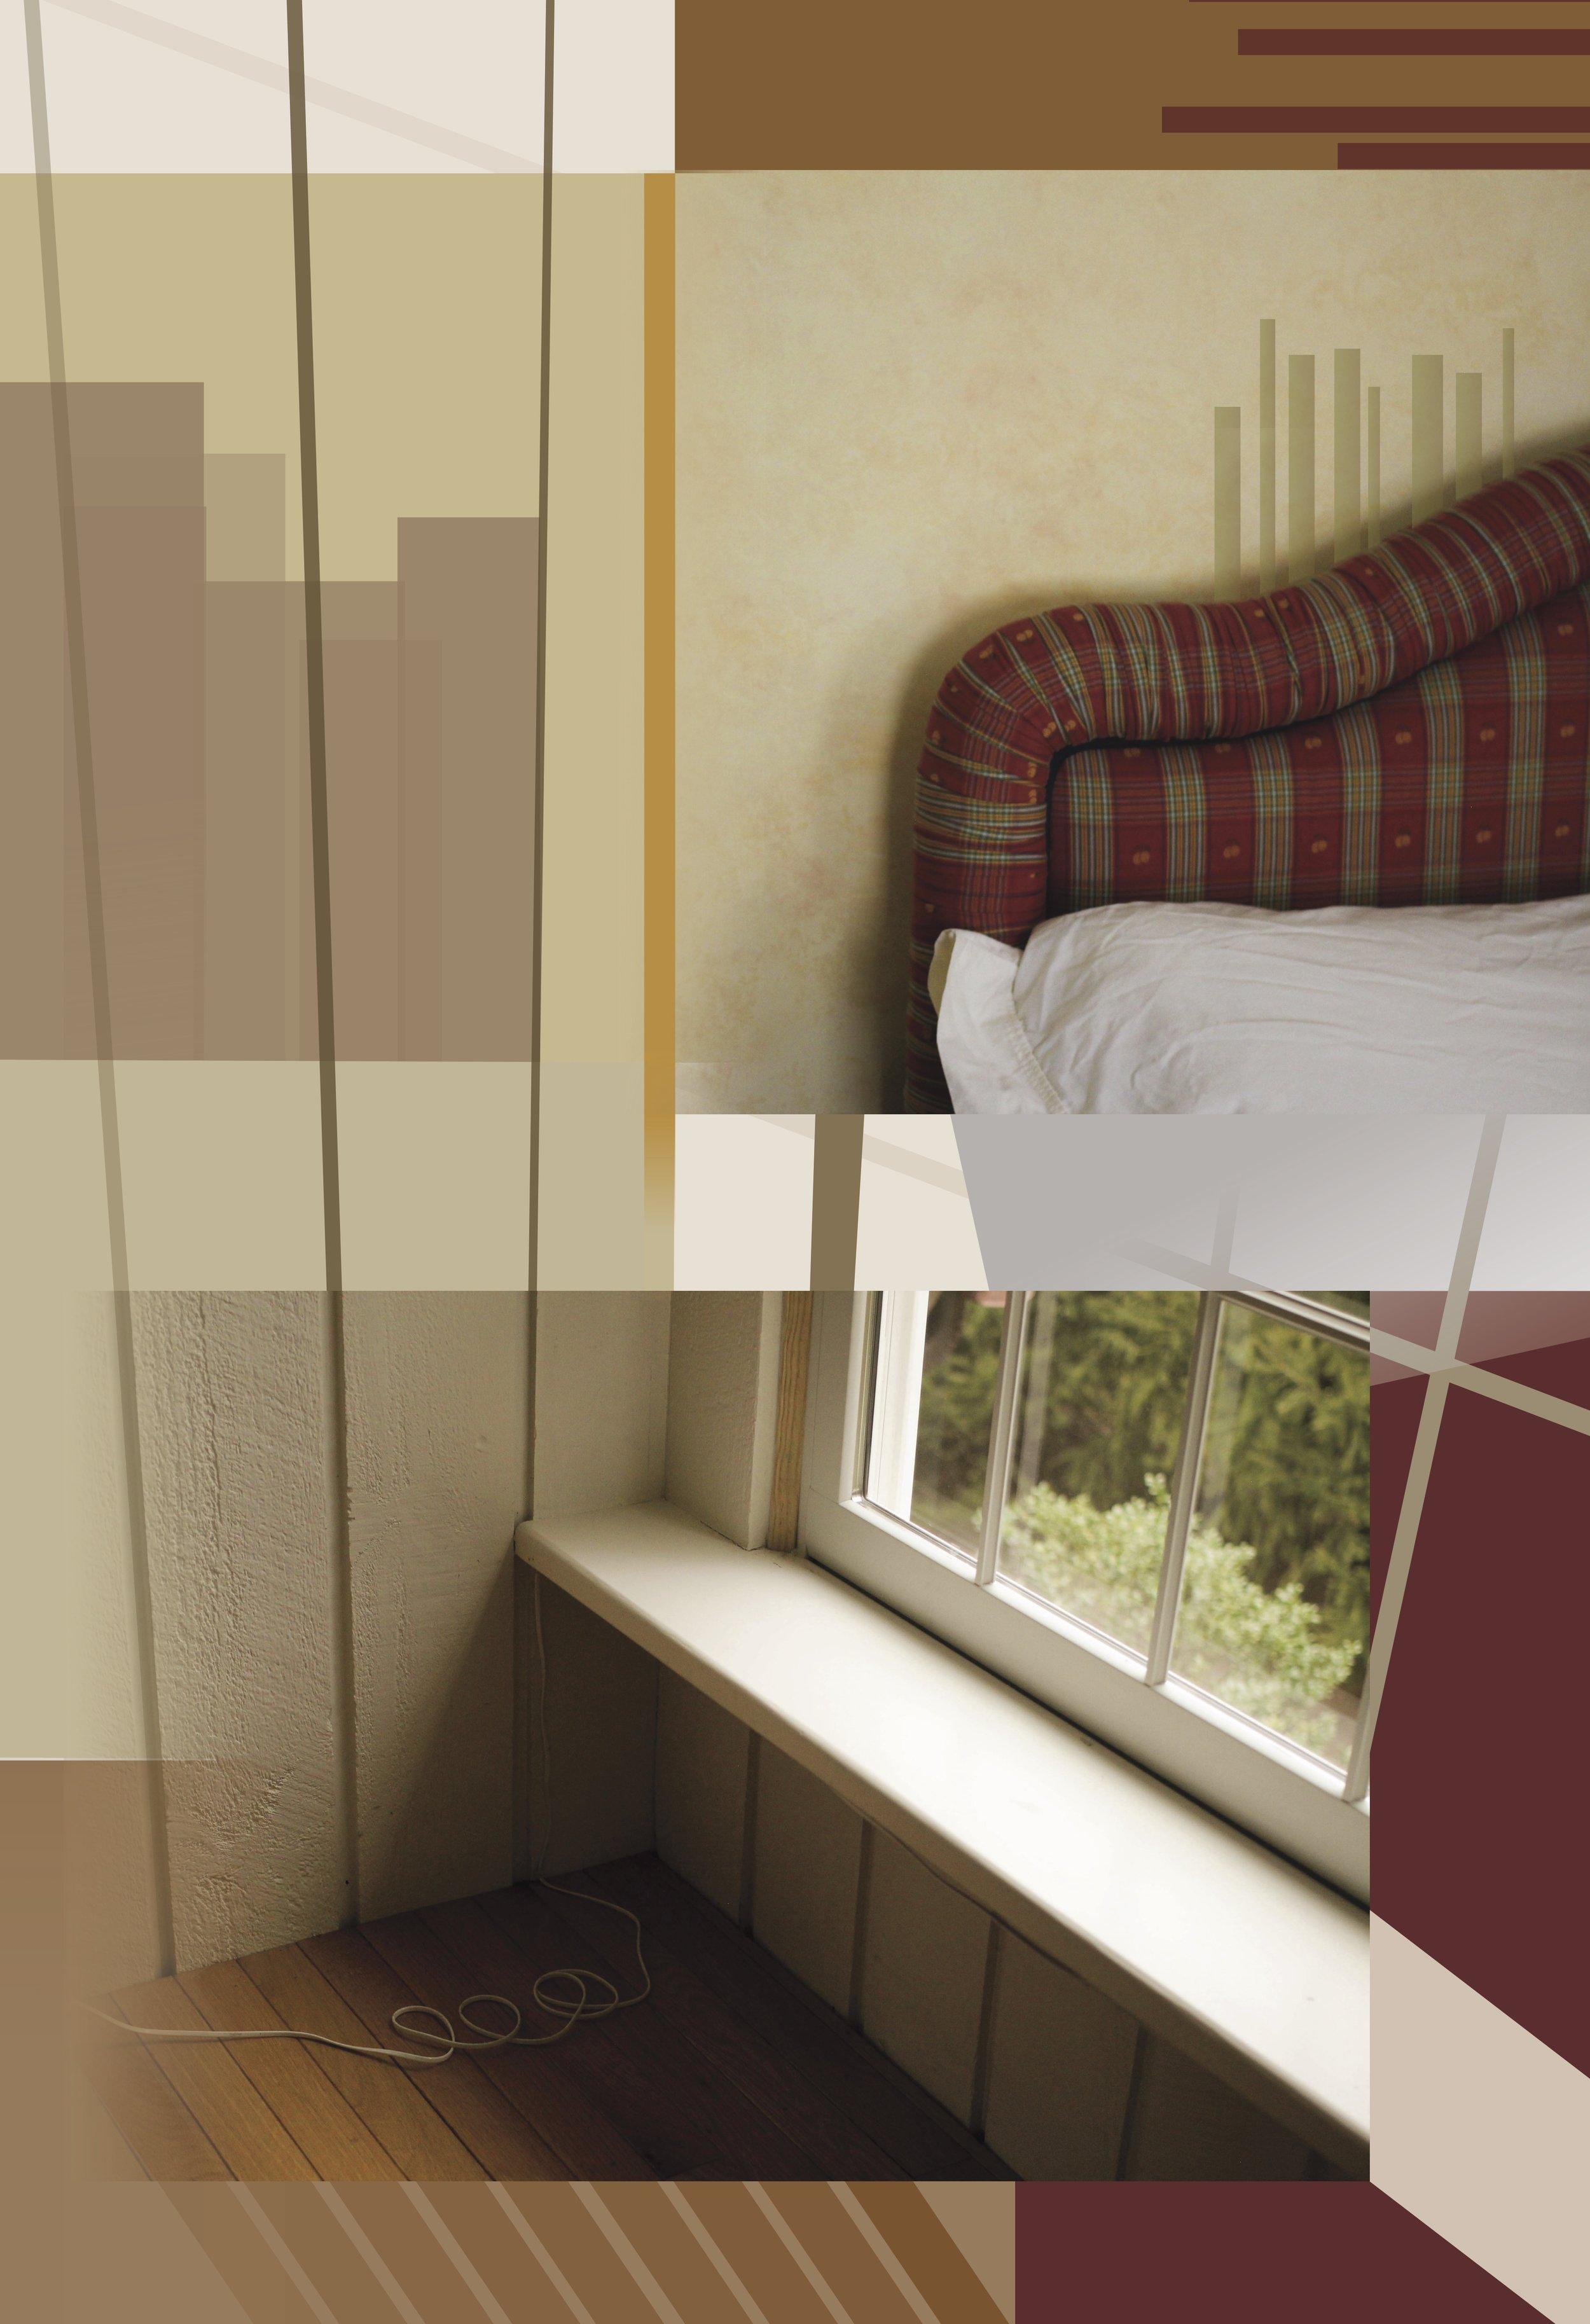 BedShapeStudy.jpg